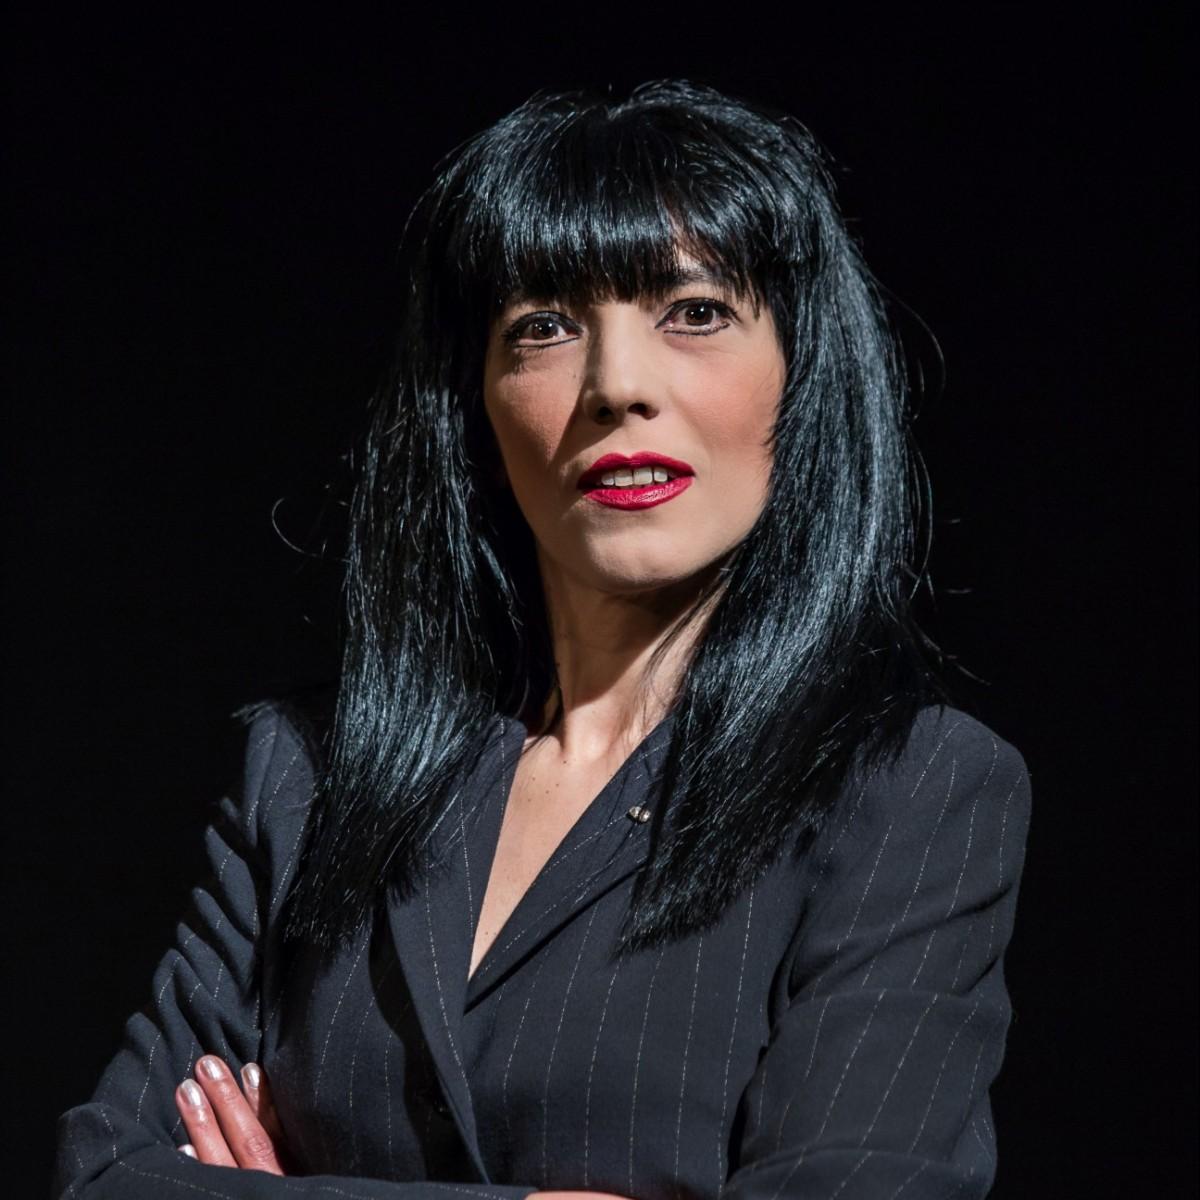 Adriana Covaci